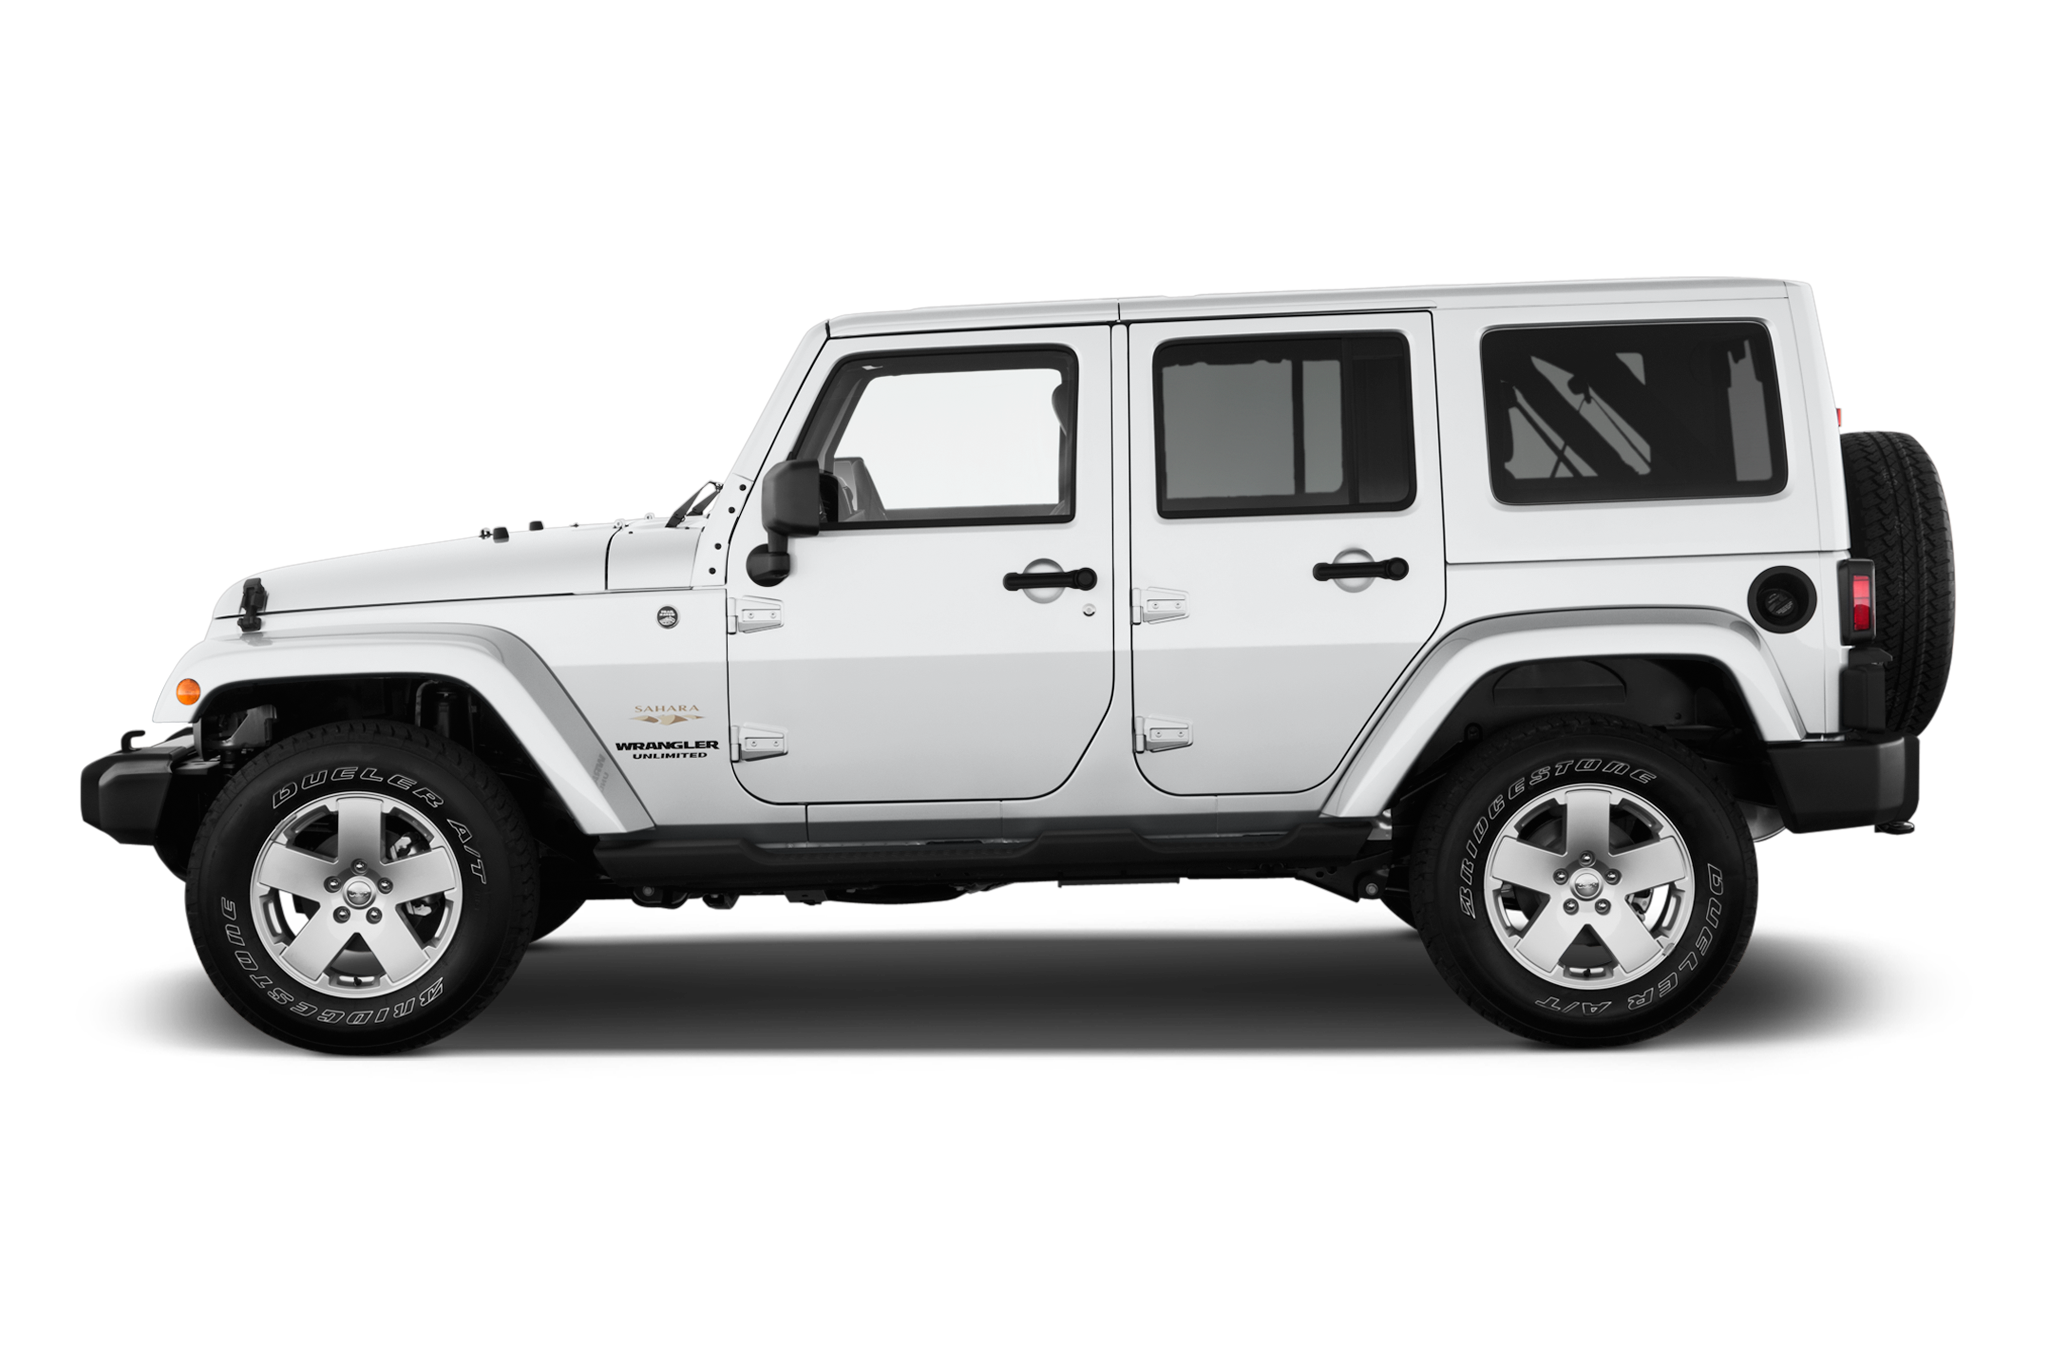 2012 jeep wrangler unlimited altitude edition editors. Black Bedroom Furniture Sets. Home Design Ideas